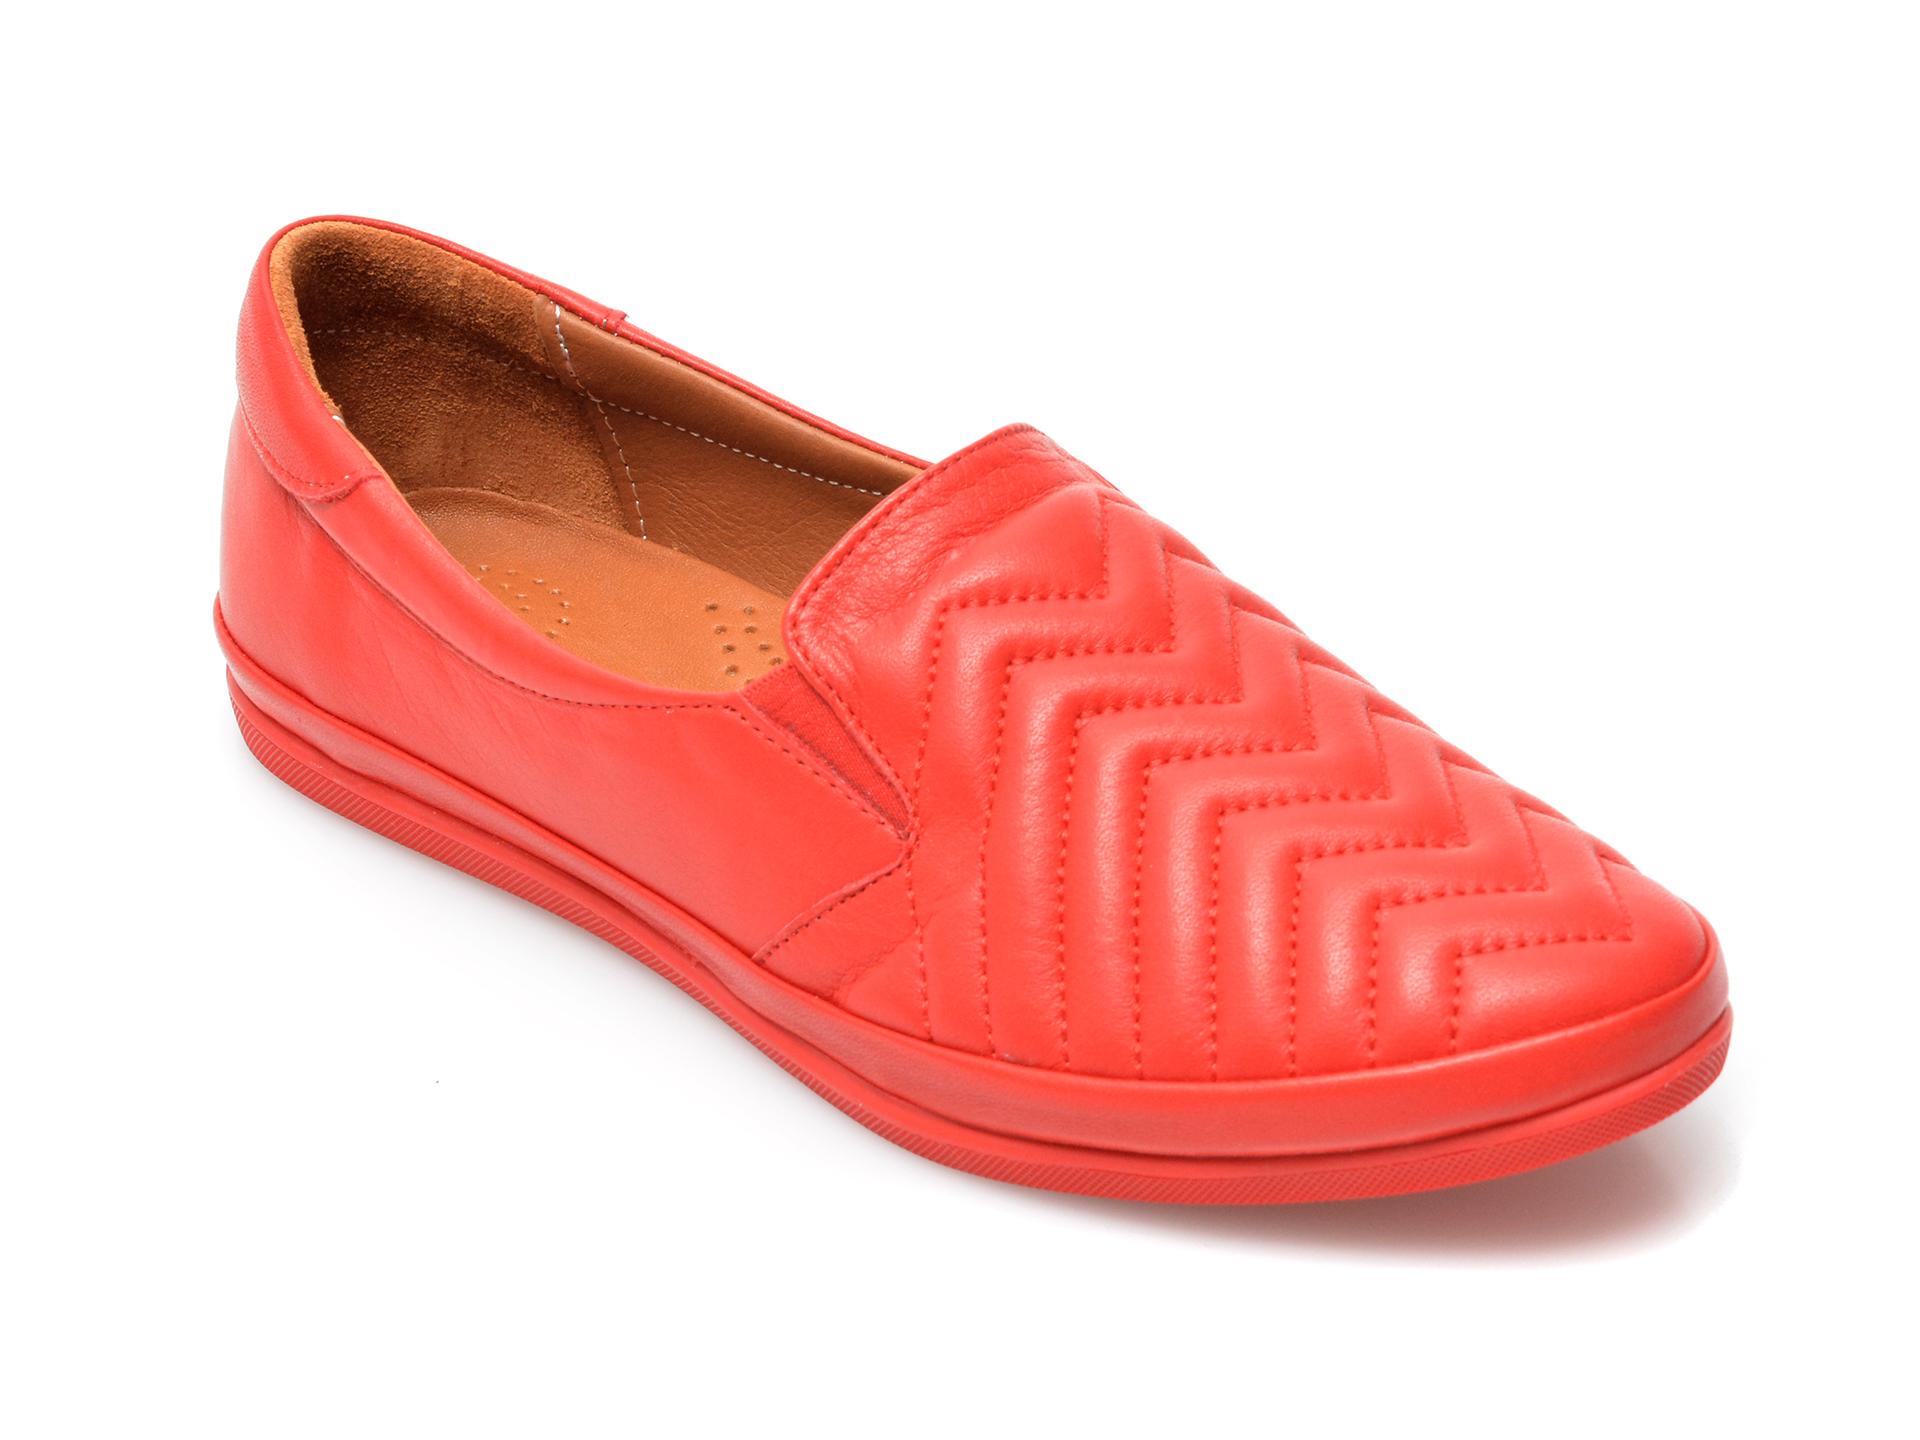 Pantofi IMAGE rosii, 120G01, din piele naturala imagine otter.ro 2021